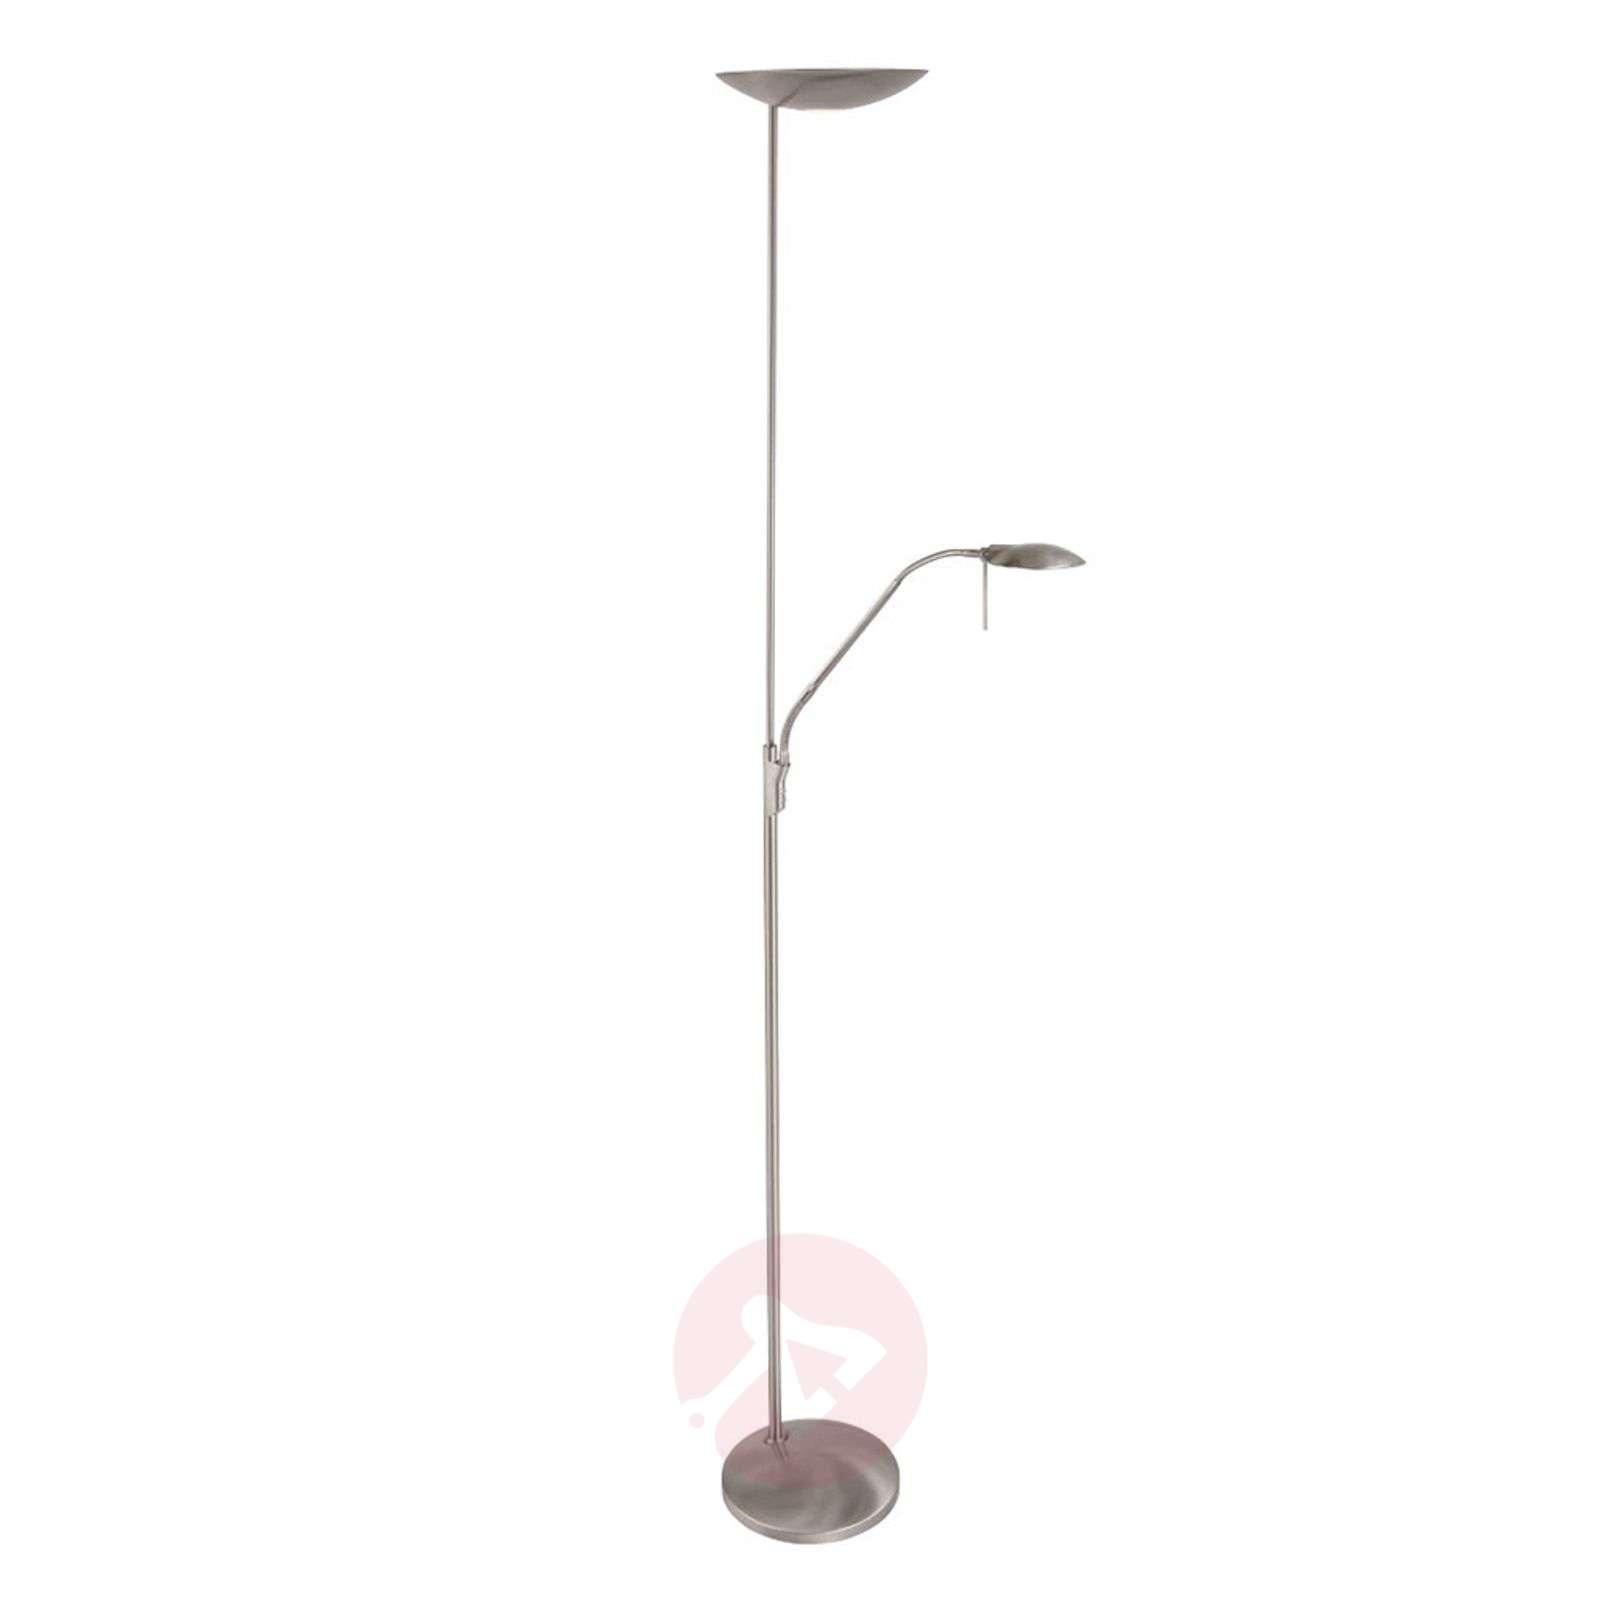 Led floor lamp tamara reading lamp dimmer steel lights led floor lamp tamara reading lamp dimmer steel 8509722 01 aloadofball Image collections